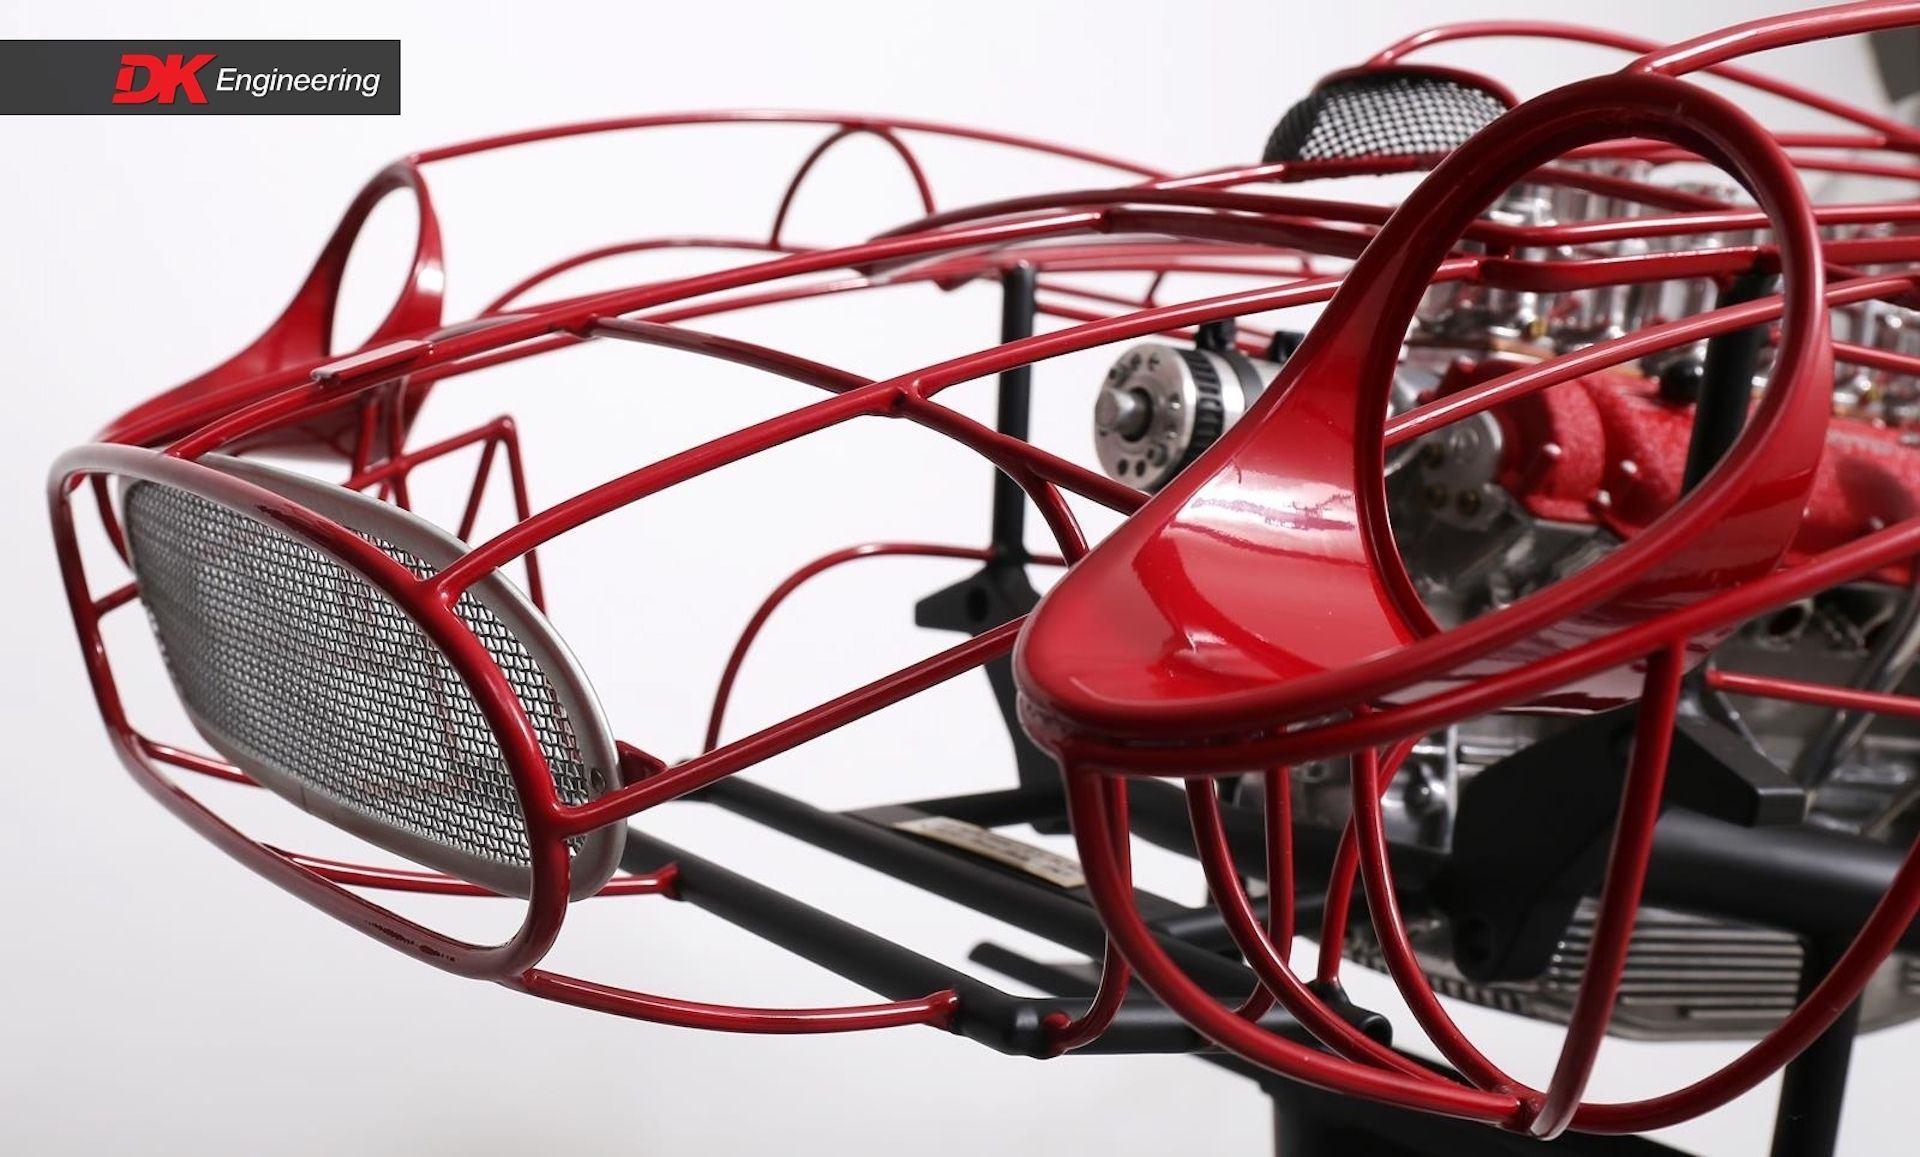 Terzo-Dalia-Ferrari-engines-9